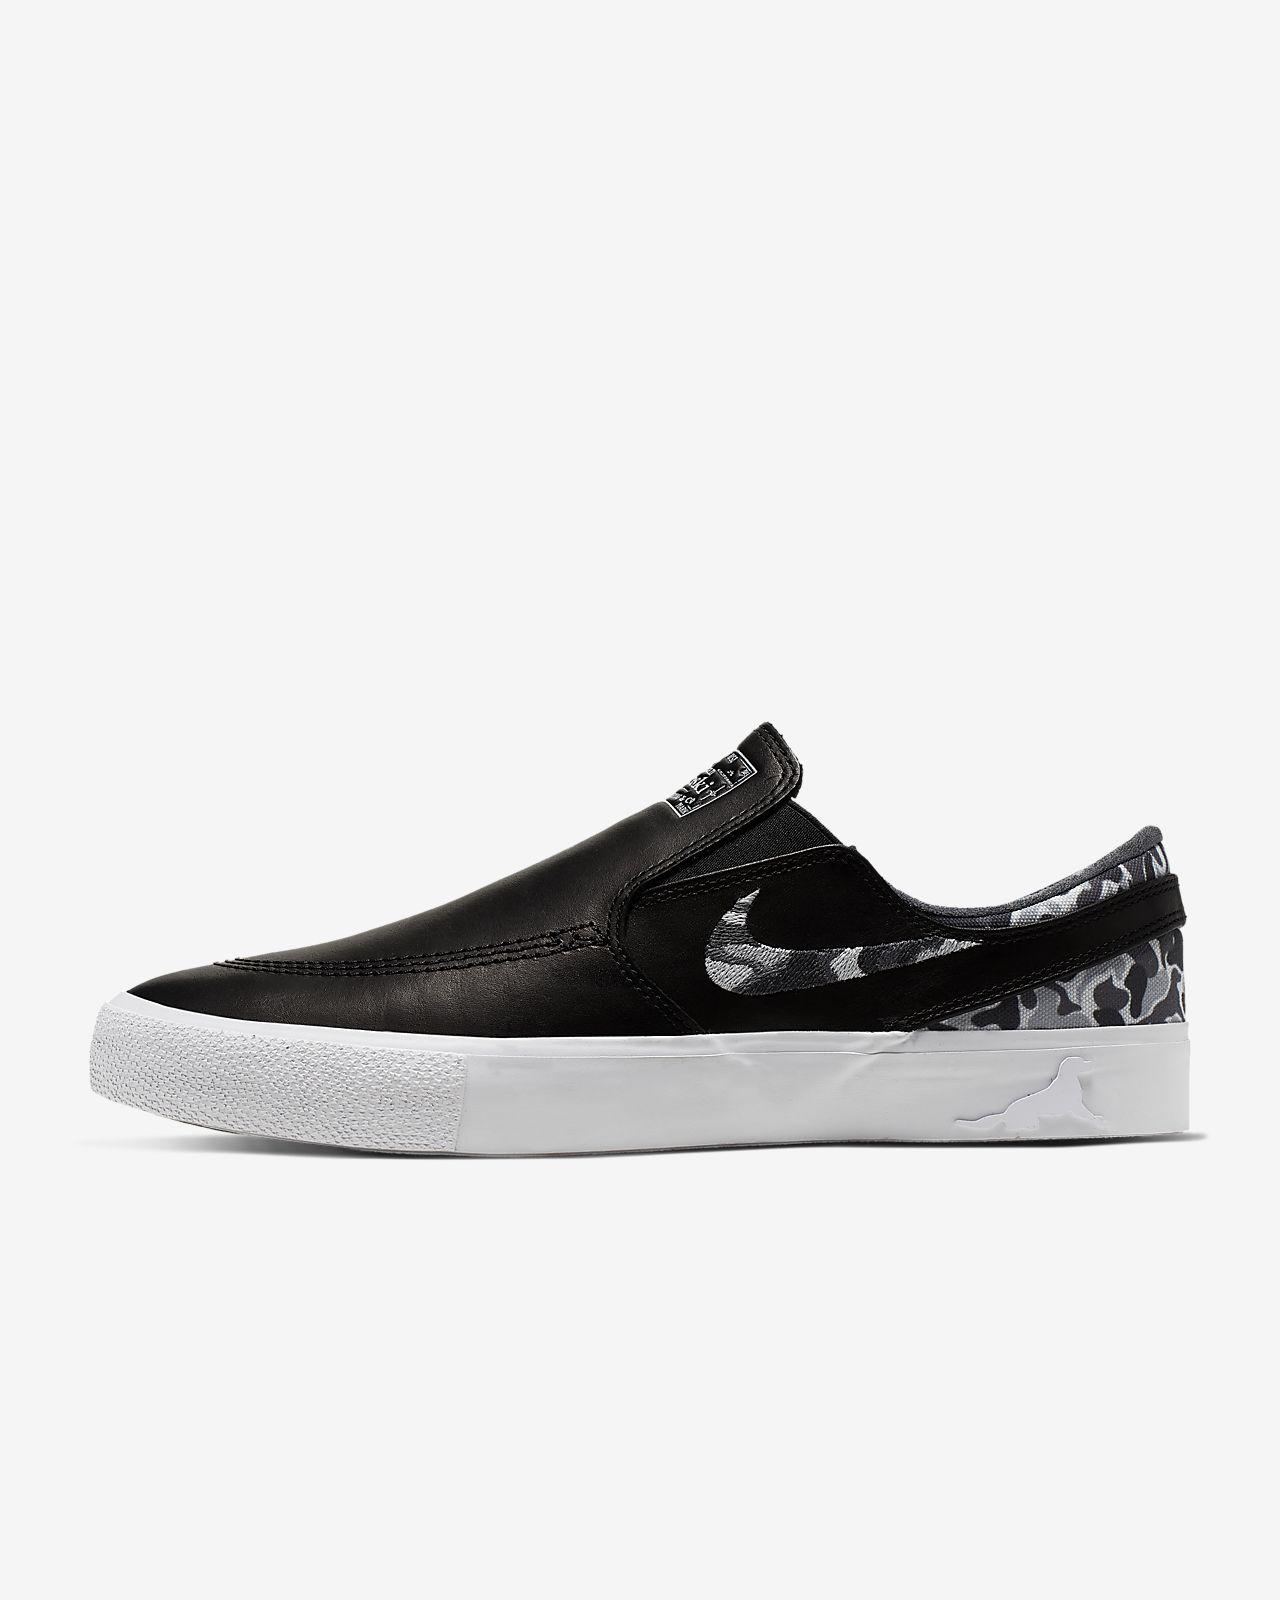 best service 2d9a8 8d26c ... Nike SB Zoom Stefan Janoski Slip RM Skate Shoe